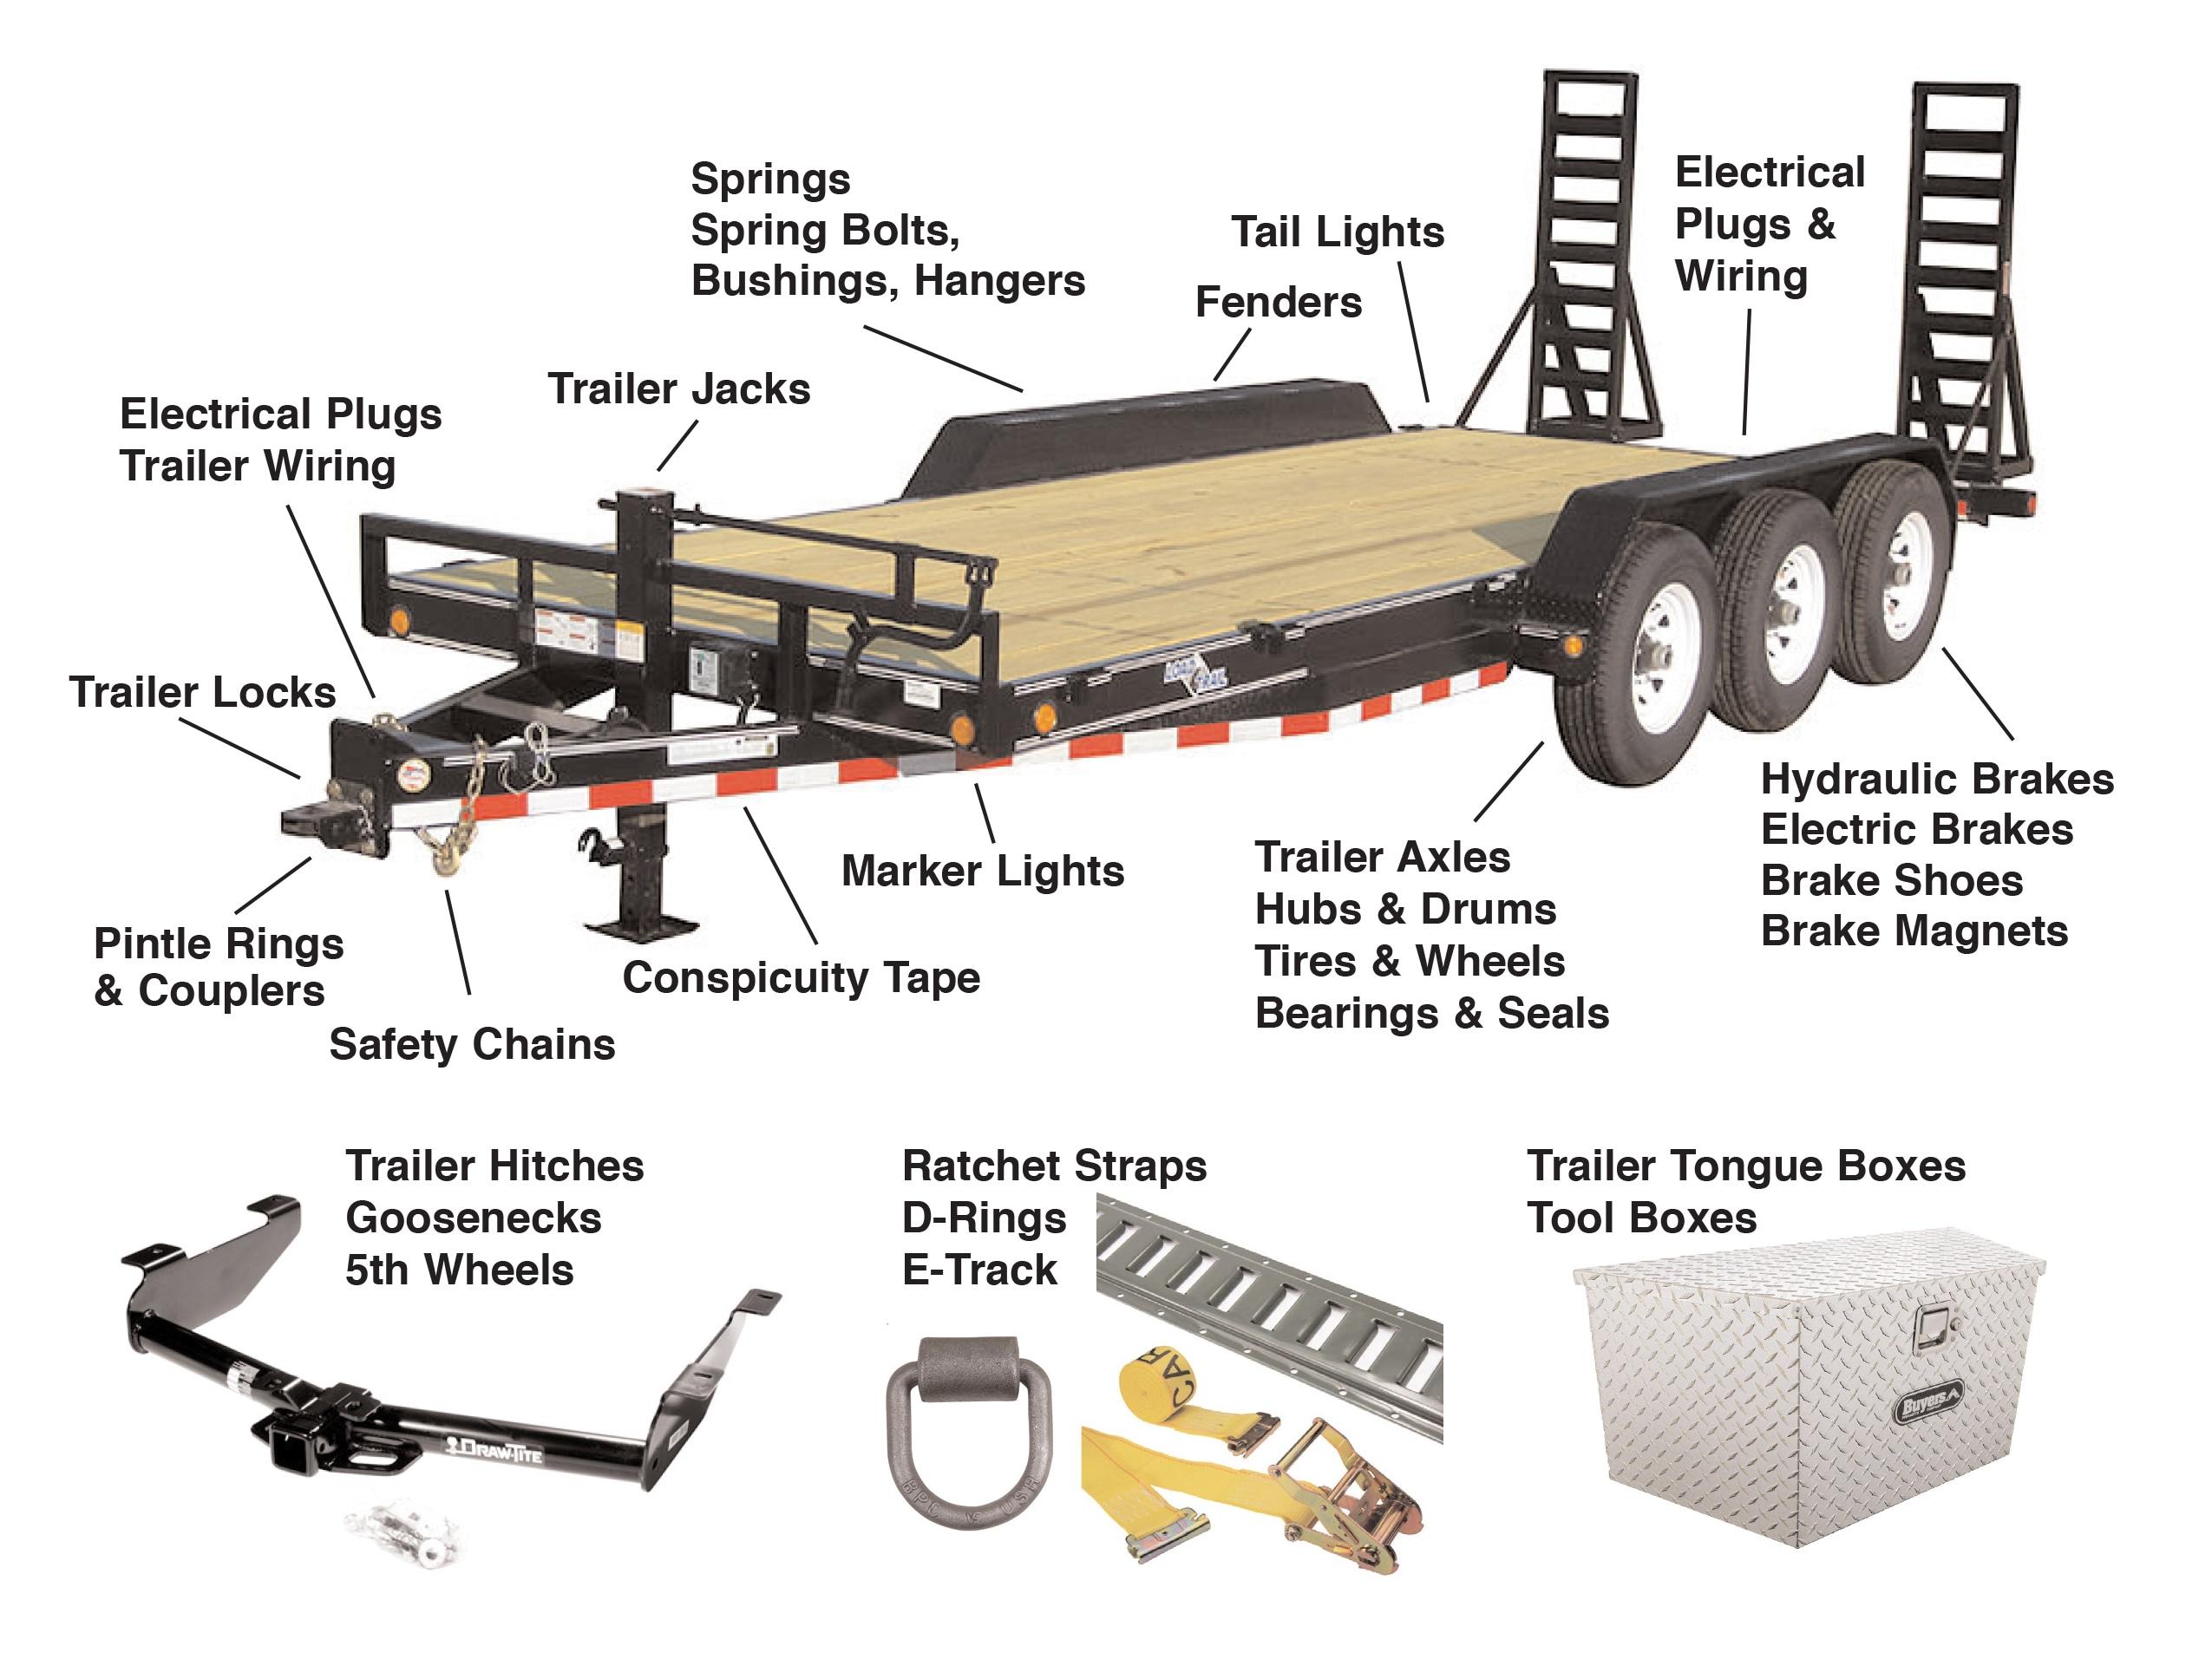 Parts Of A Camper : Truck trailer parts in barre vt midstate chrysler